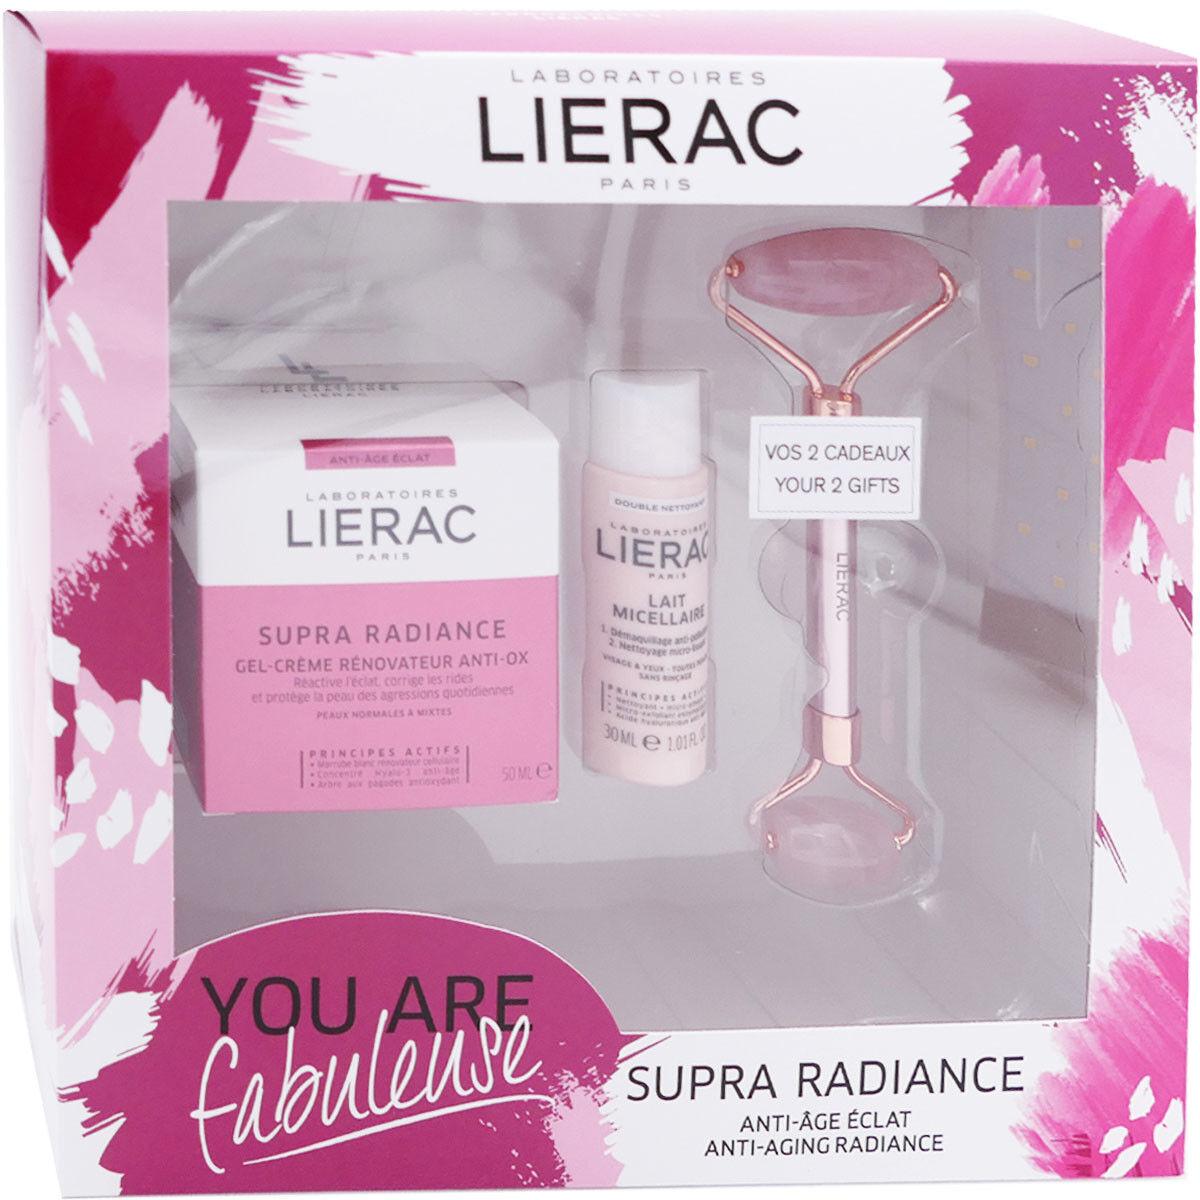 Lierac coffret supra radiance gel creme renovateur anti-ox 50ml + 2 soins offert